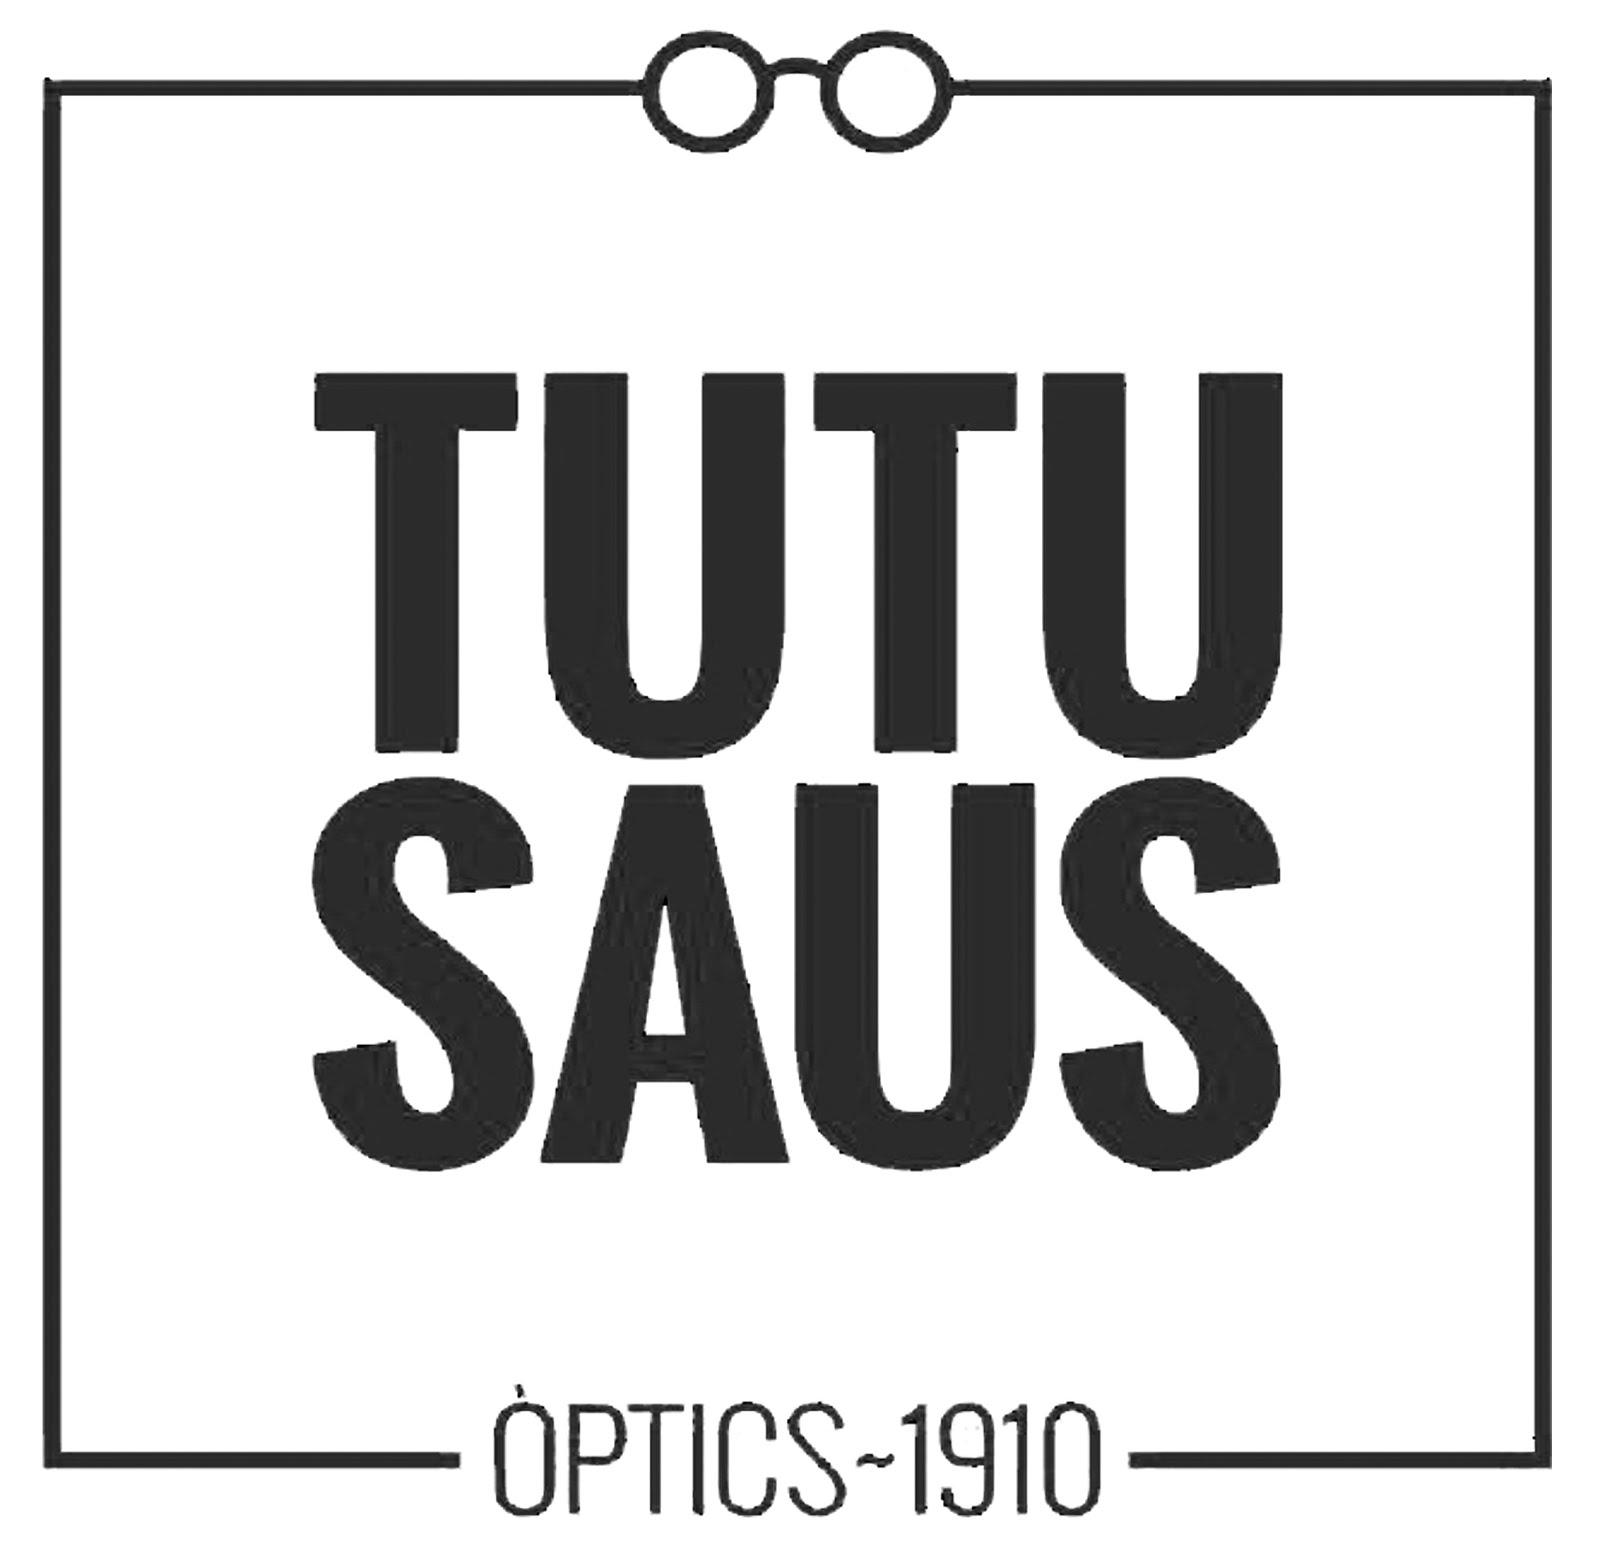 Òptiques Tutusaus